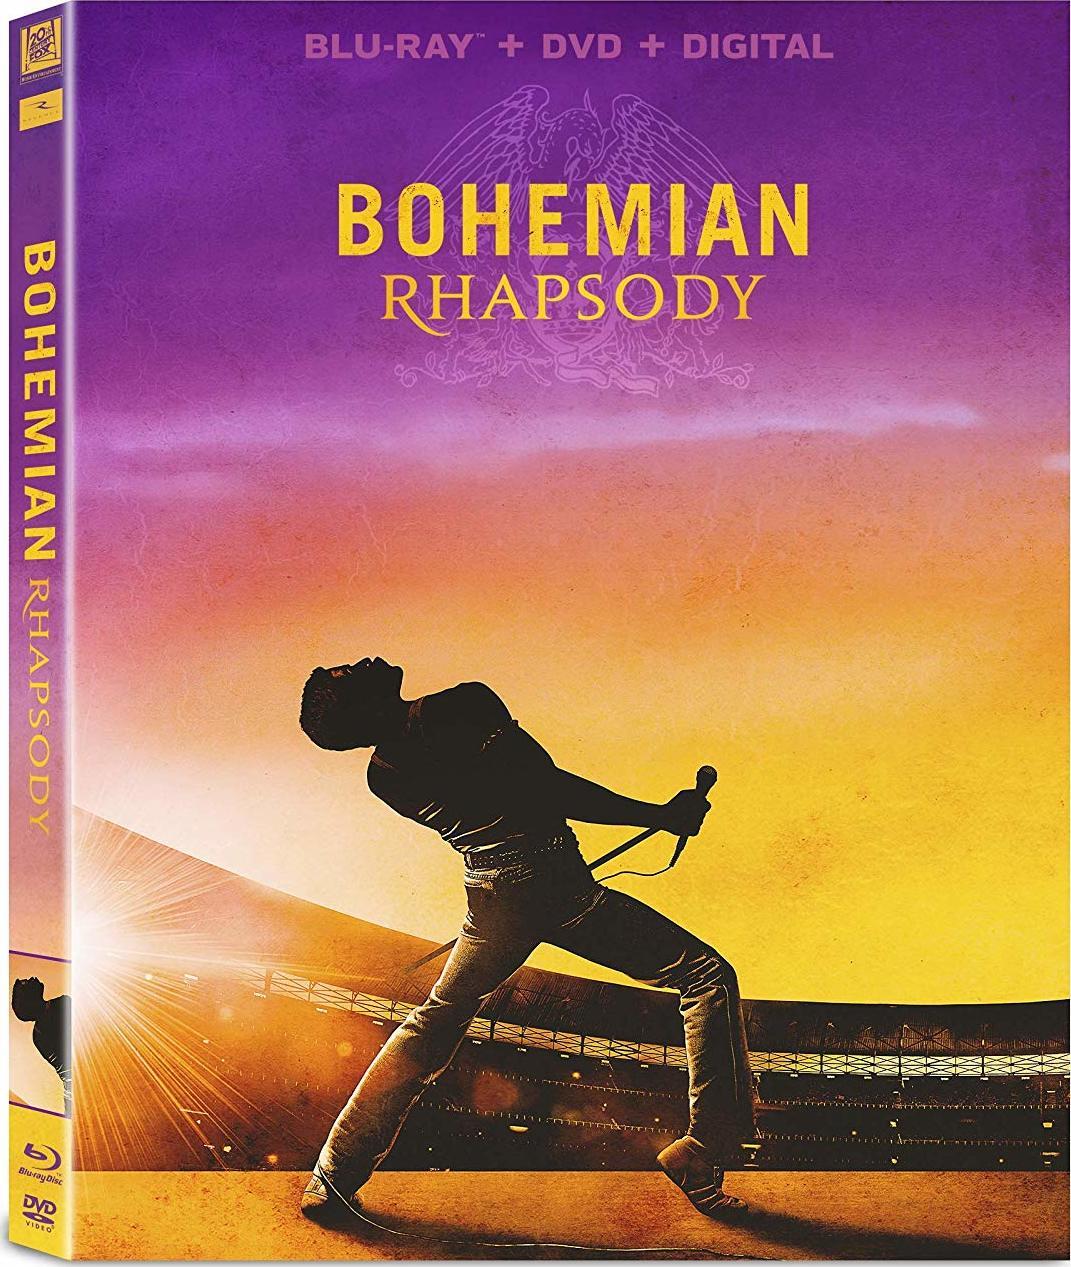 Bohemian Rhapsody (2018) Bohemian Rhapsody: La Historia de Freddie Mercury (2018) [AC3 5.1 + SUP] [Blu Ray-Rip] [GOOGLEDRIVE] - Página 3 220955_front